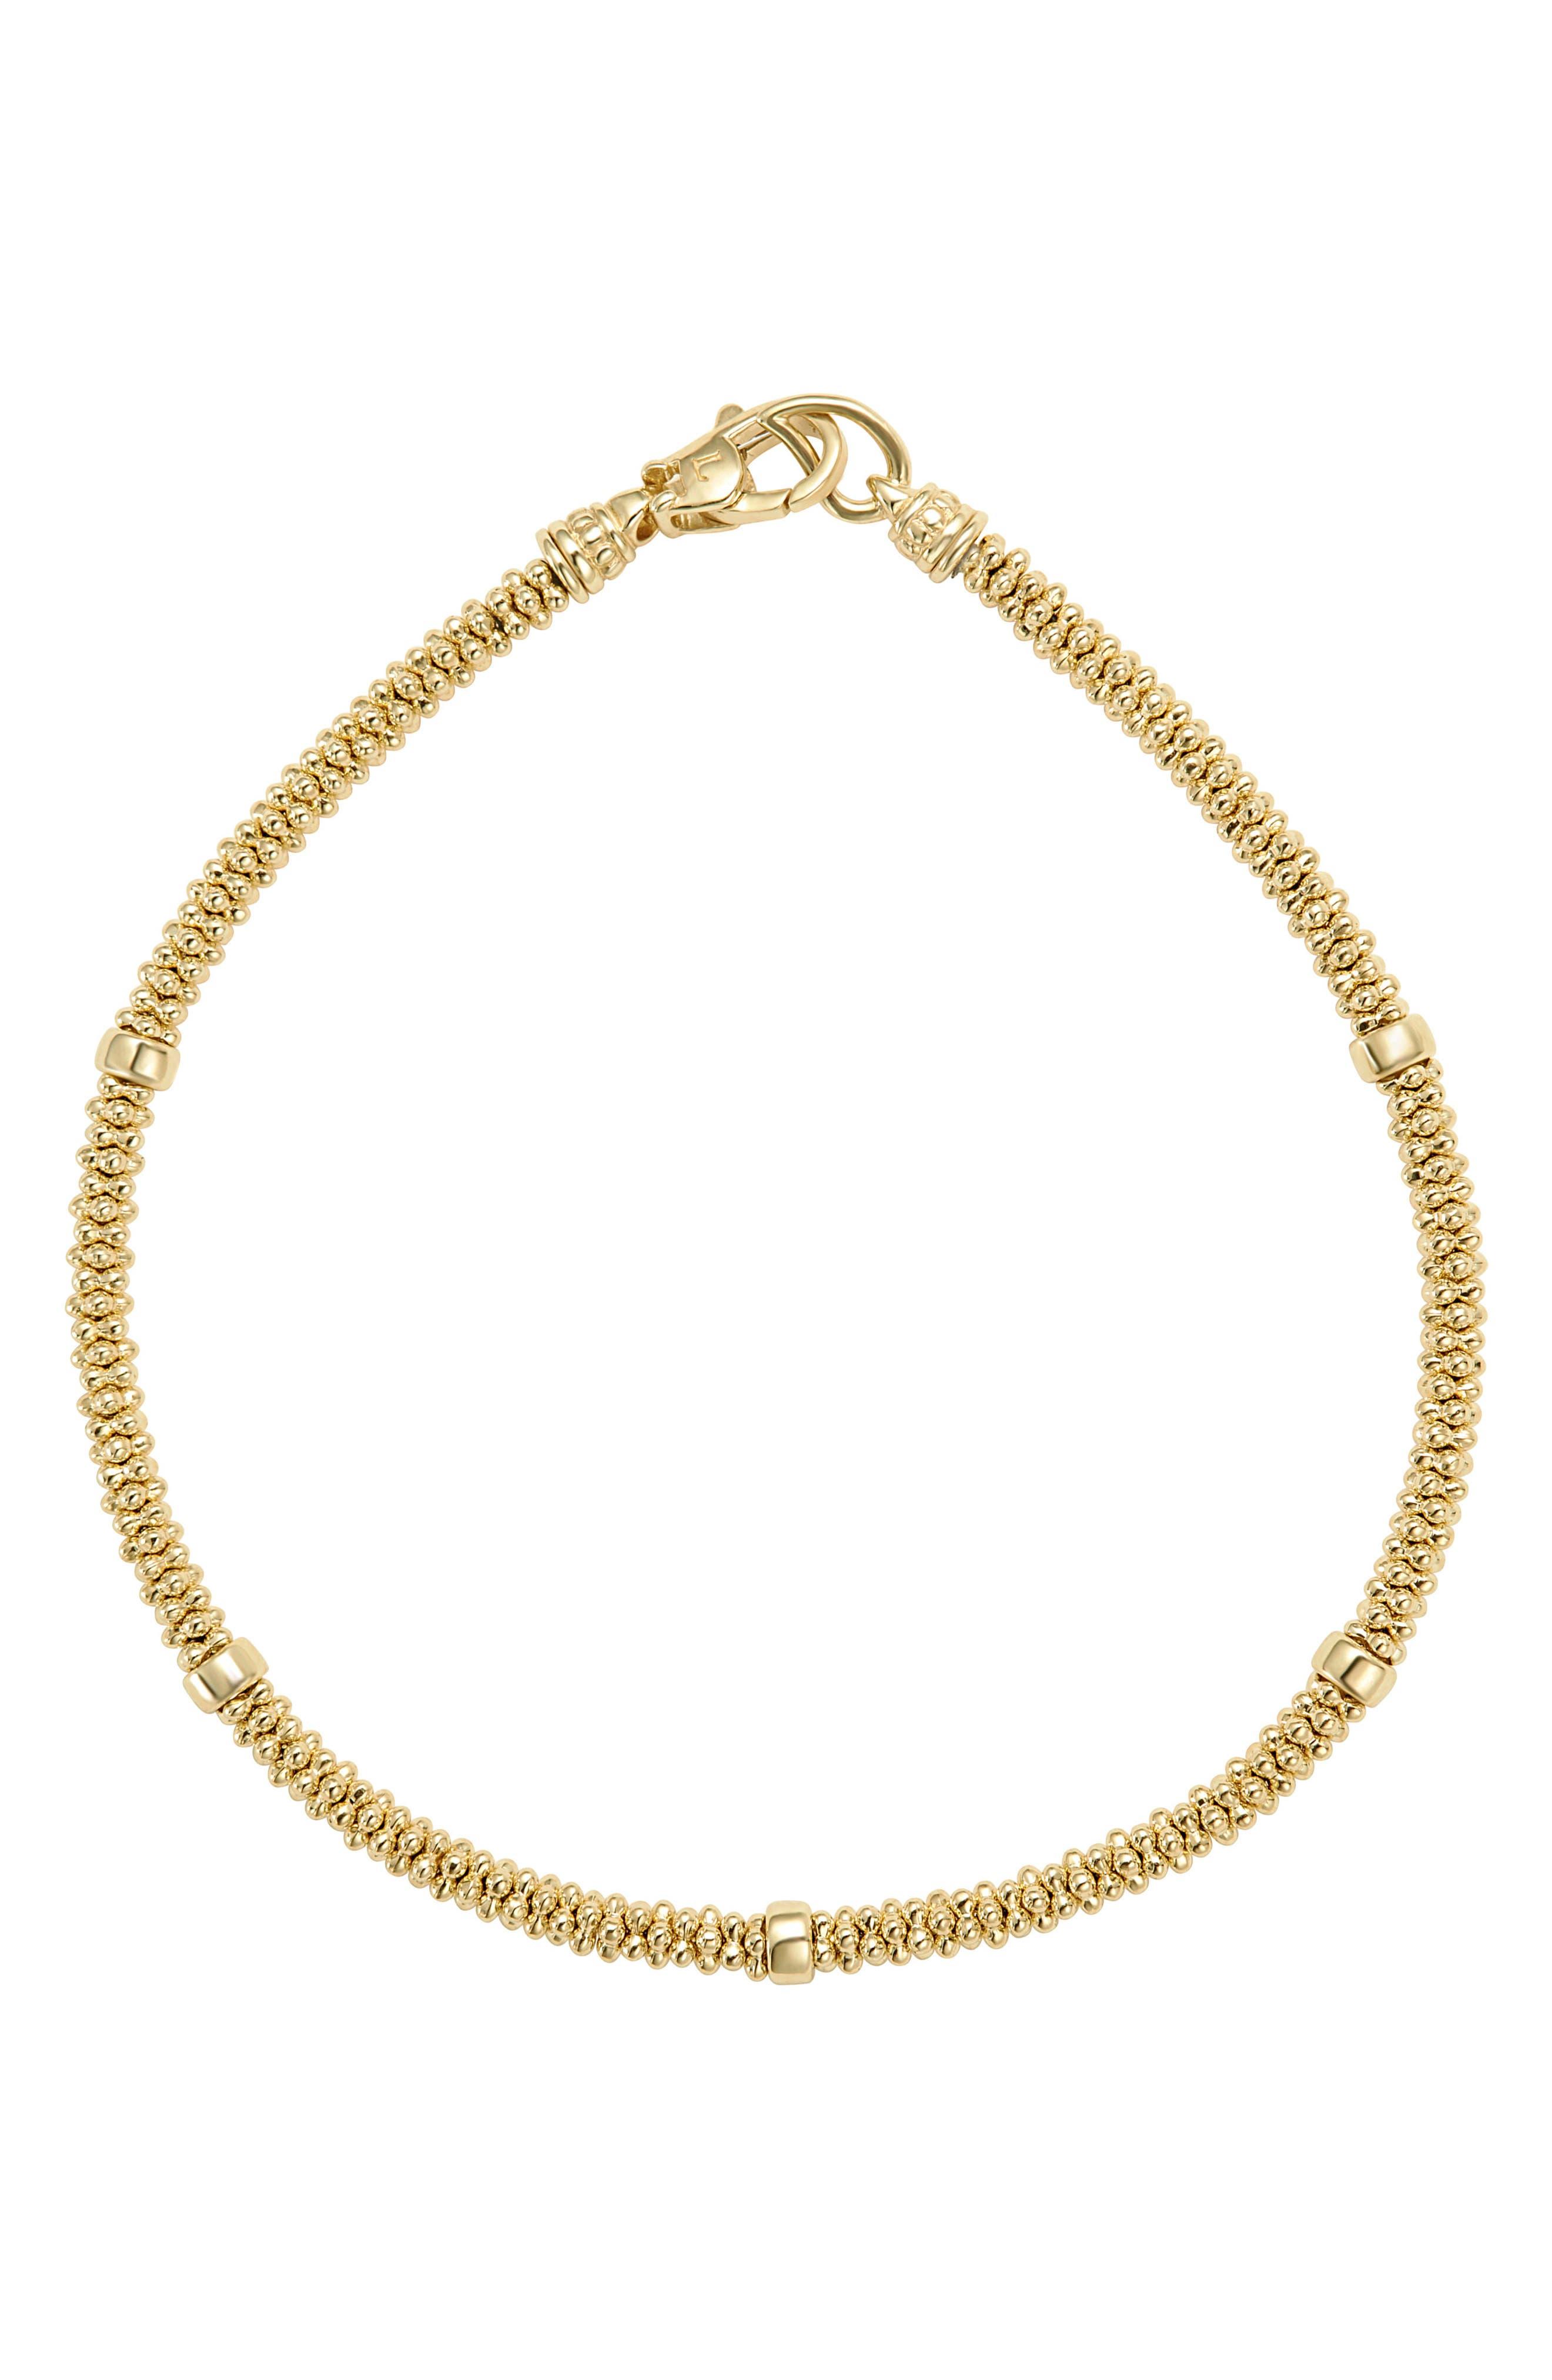 LAGOS Caviar Gold Rope Bracelet, Main, color, GOLD